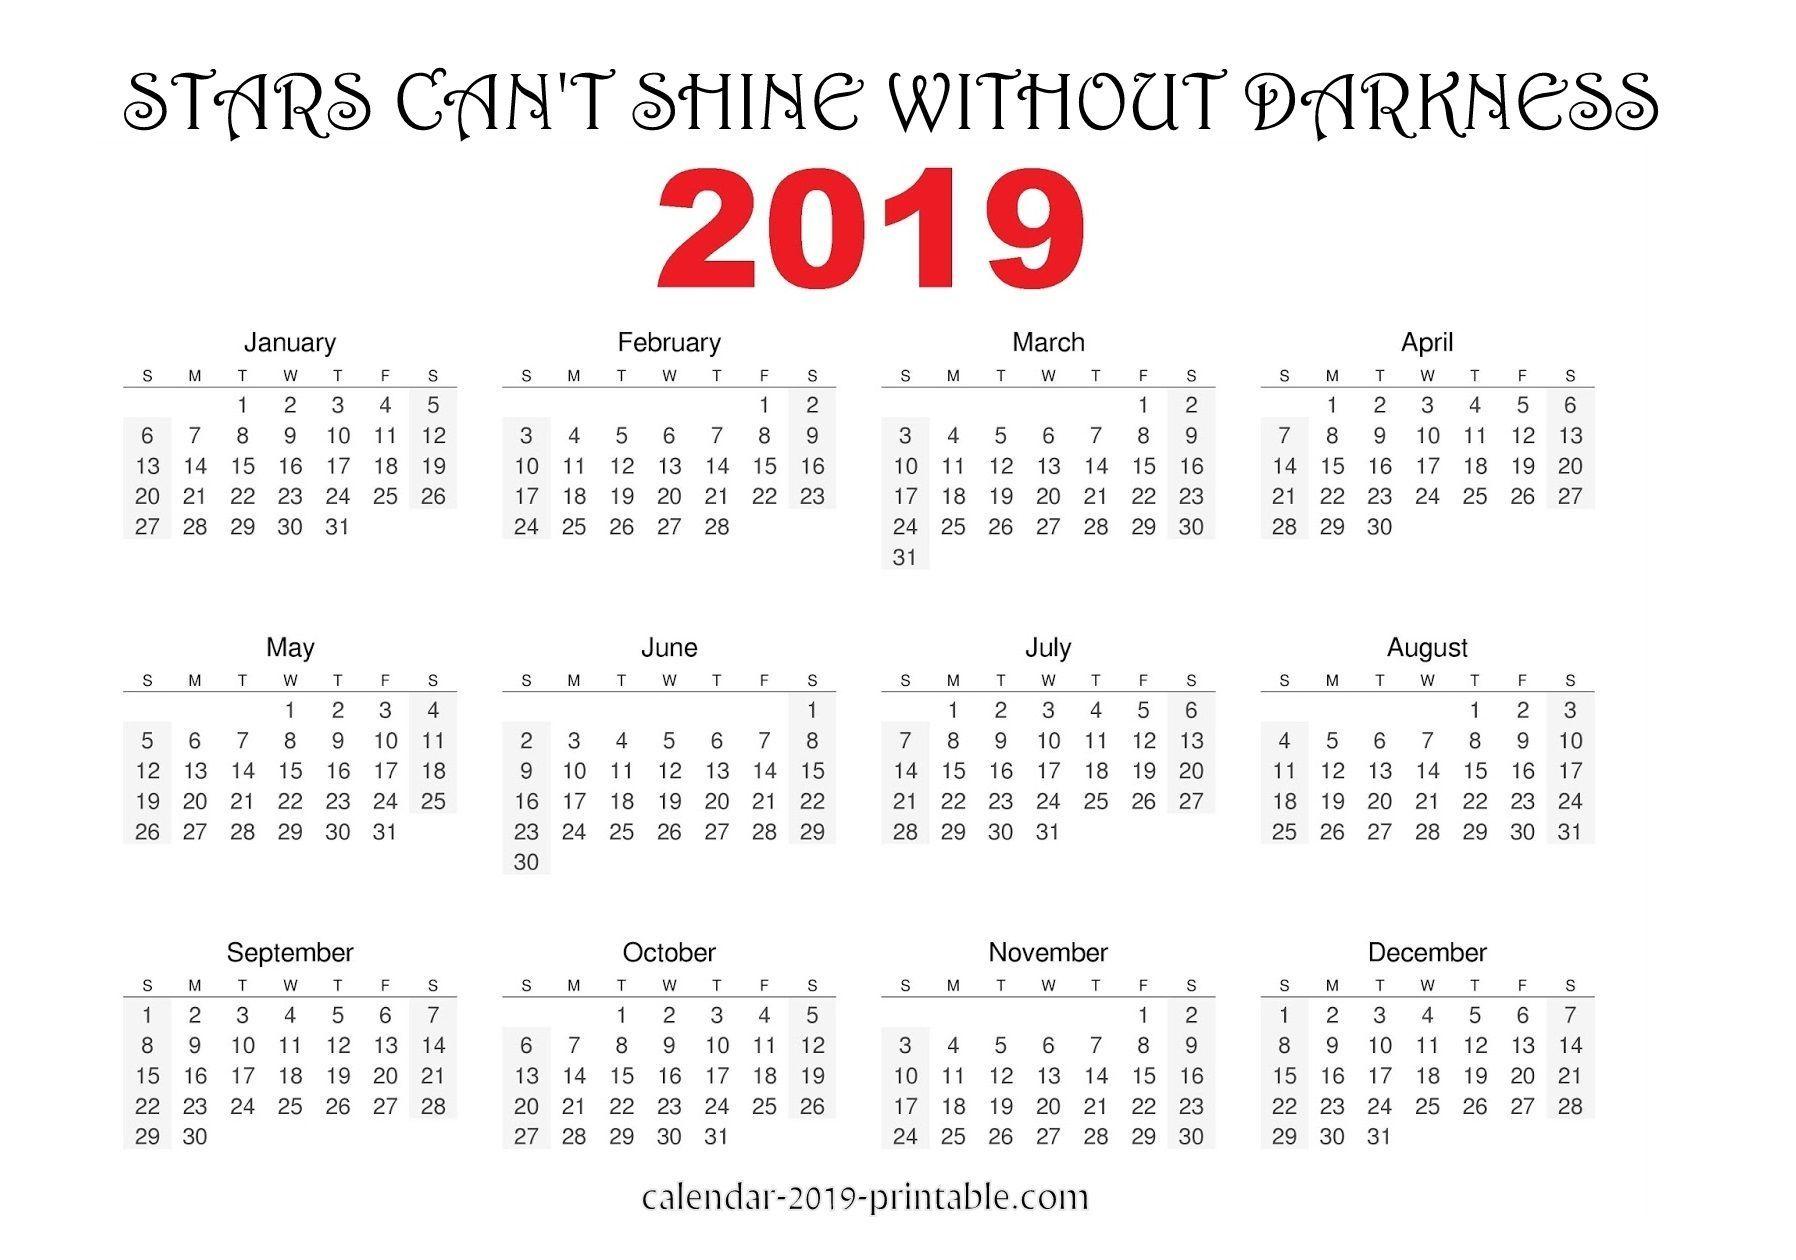 2019 Inspirational Quotes Calendar 2019 Calendars Pinterest